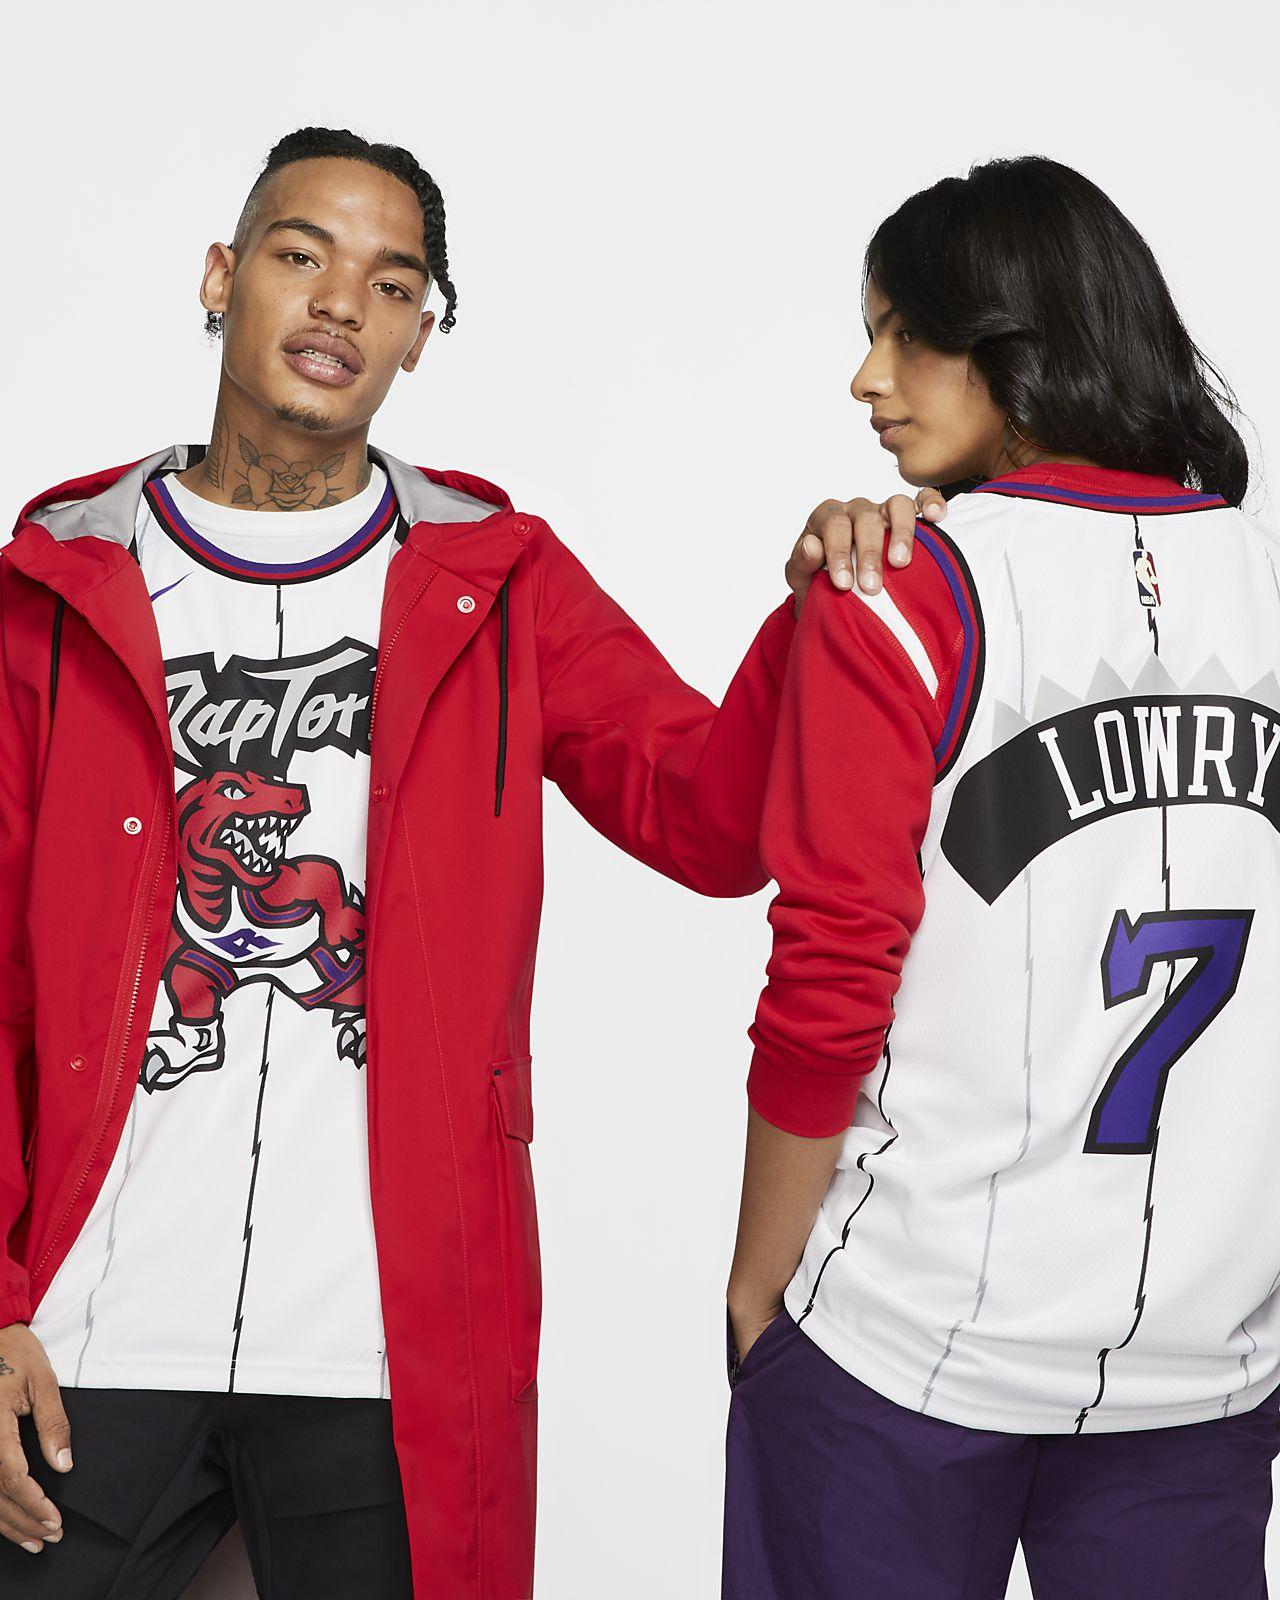 Kyle Lowry Classic Edition Swingman (Toronto Raptors) Nike NBA Connected férfimez